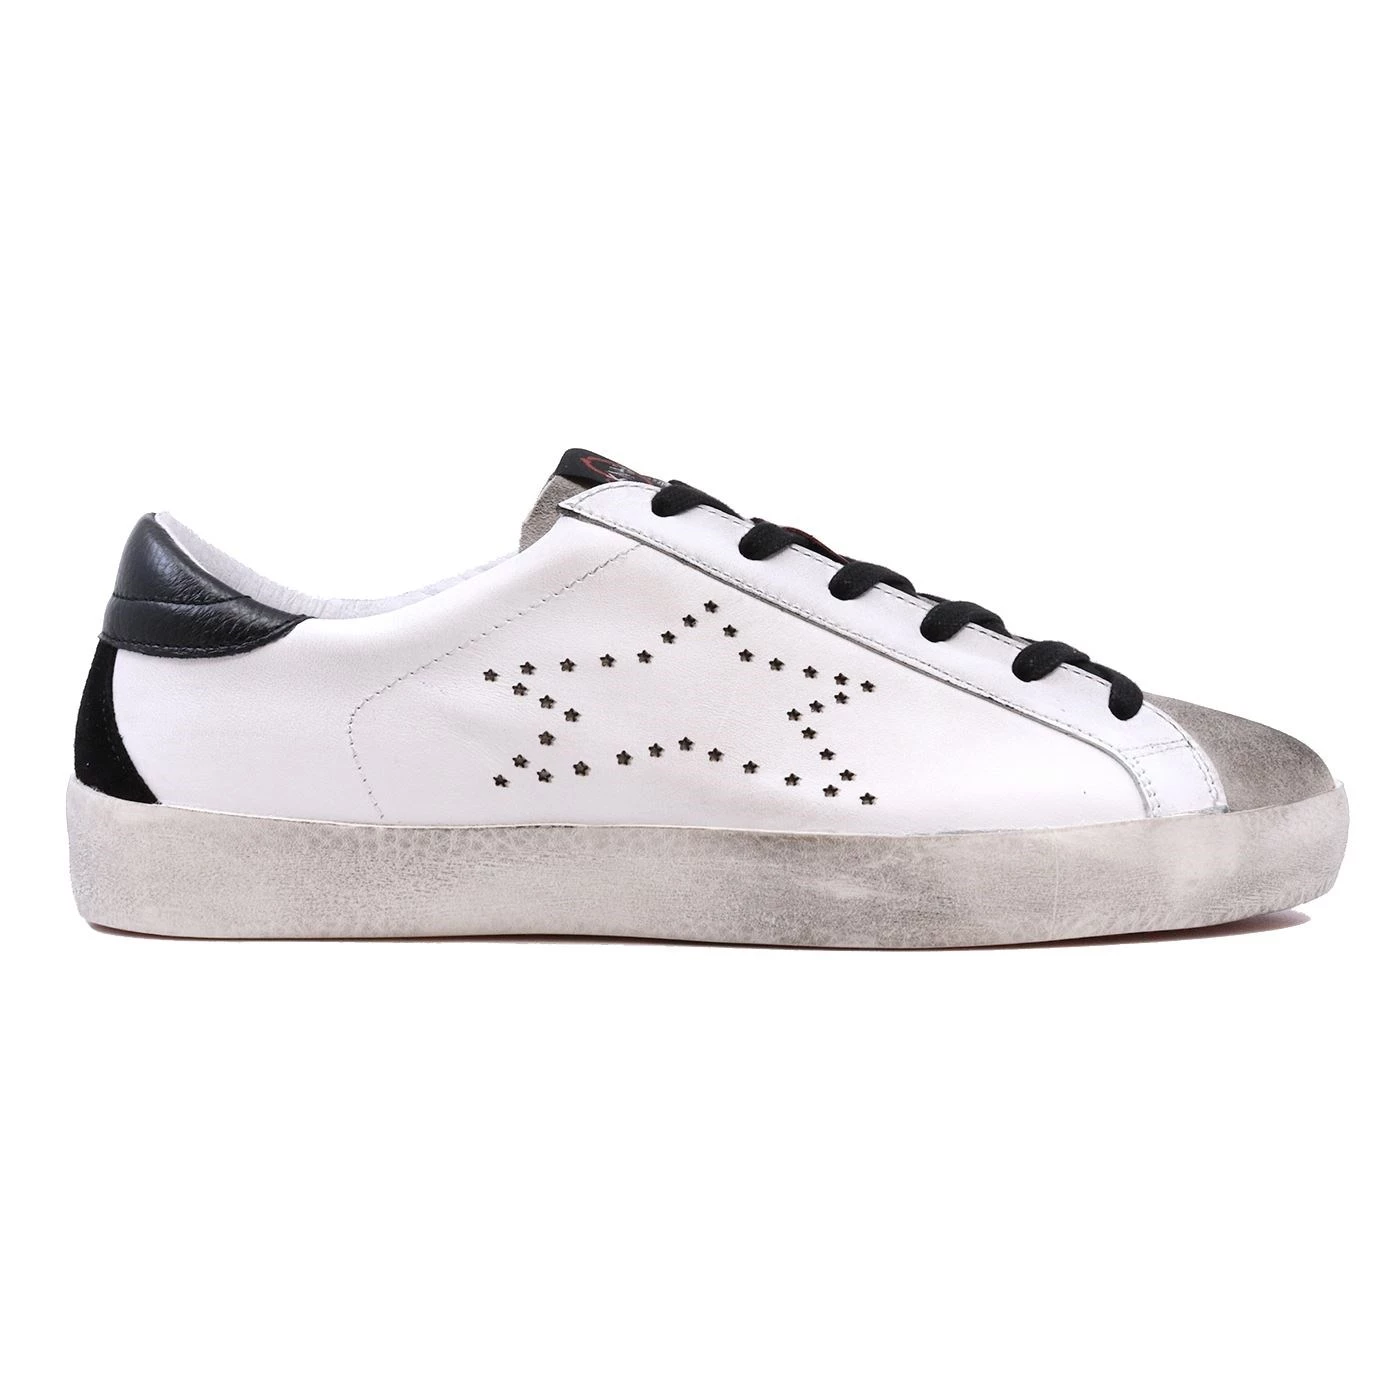 Ishikawa Low 1806 sneaker da uomo in pelle bianca